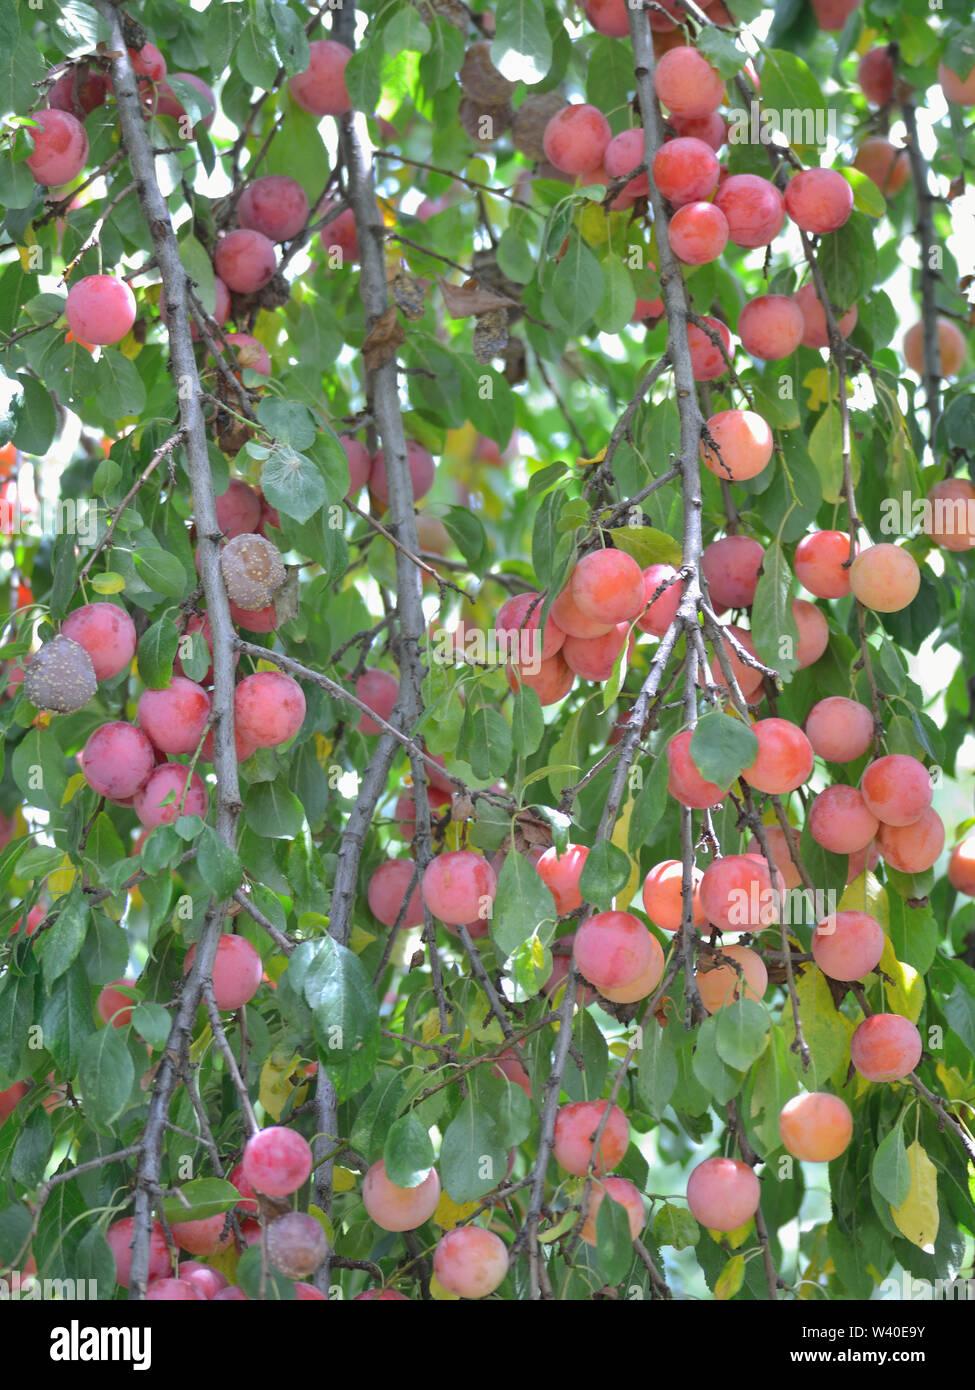 Plums on plum tree - Stock Image